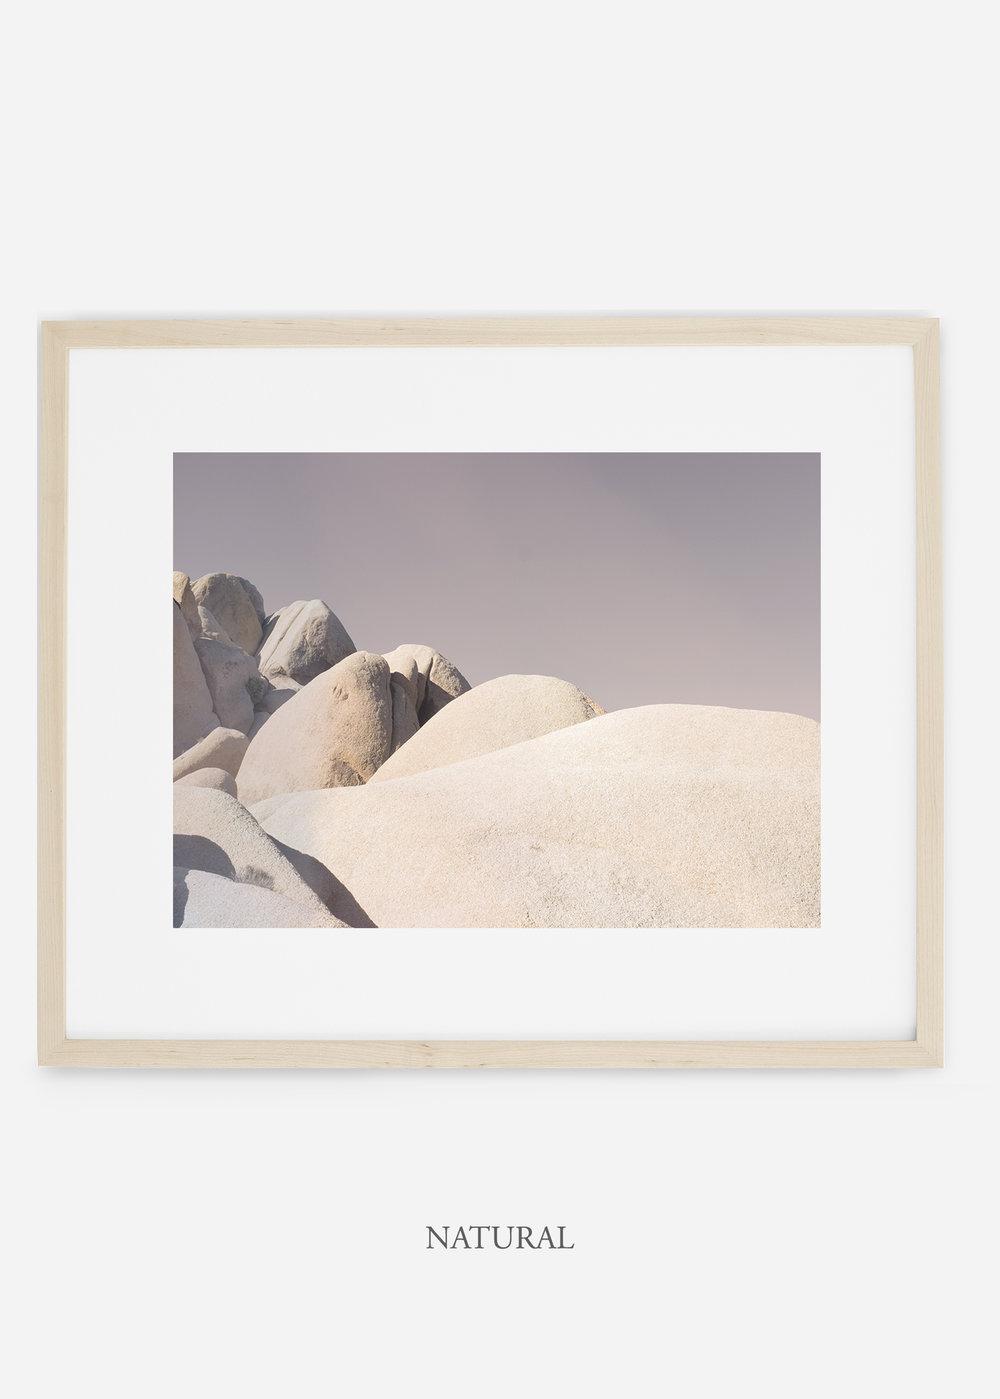 JoshuaTree_naturalframe__Rocks No.5_interiordesign_cactusprint_art.jpg